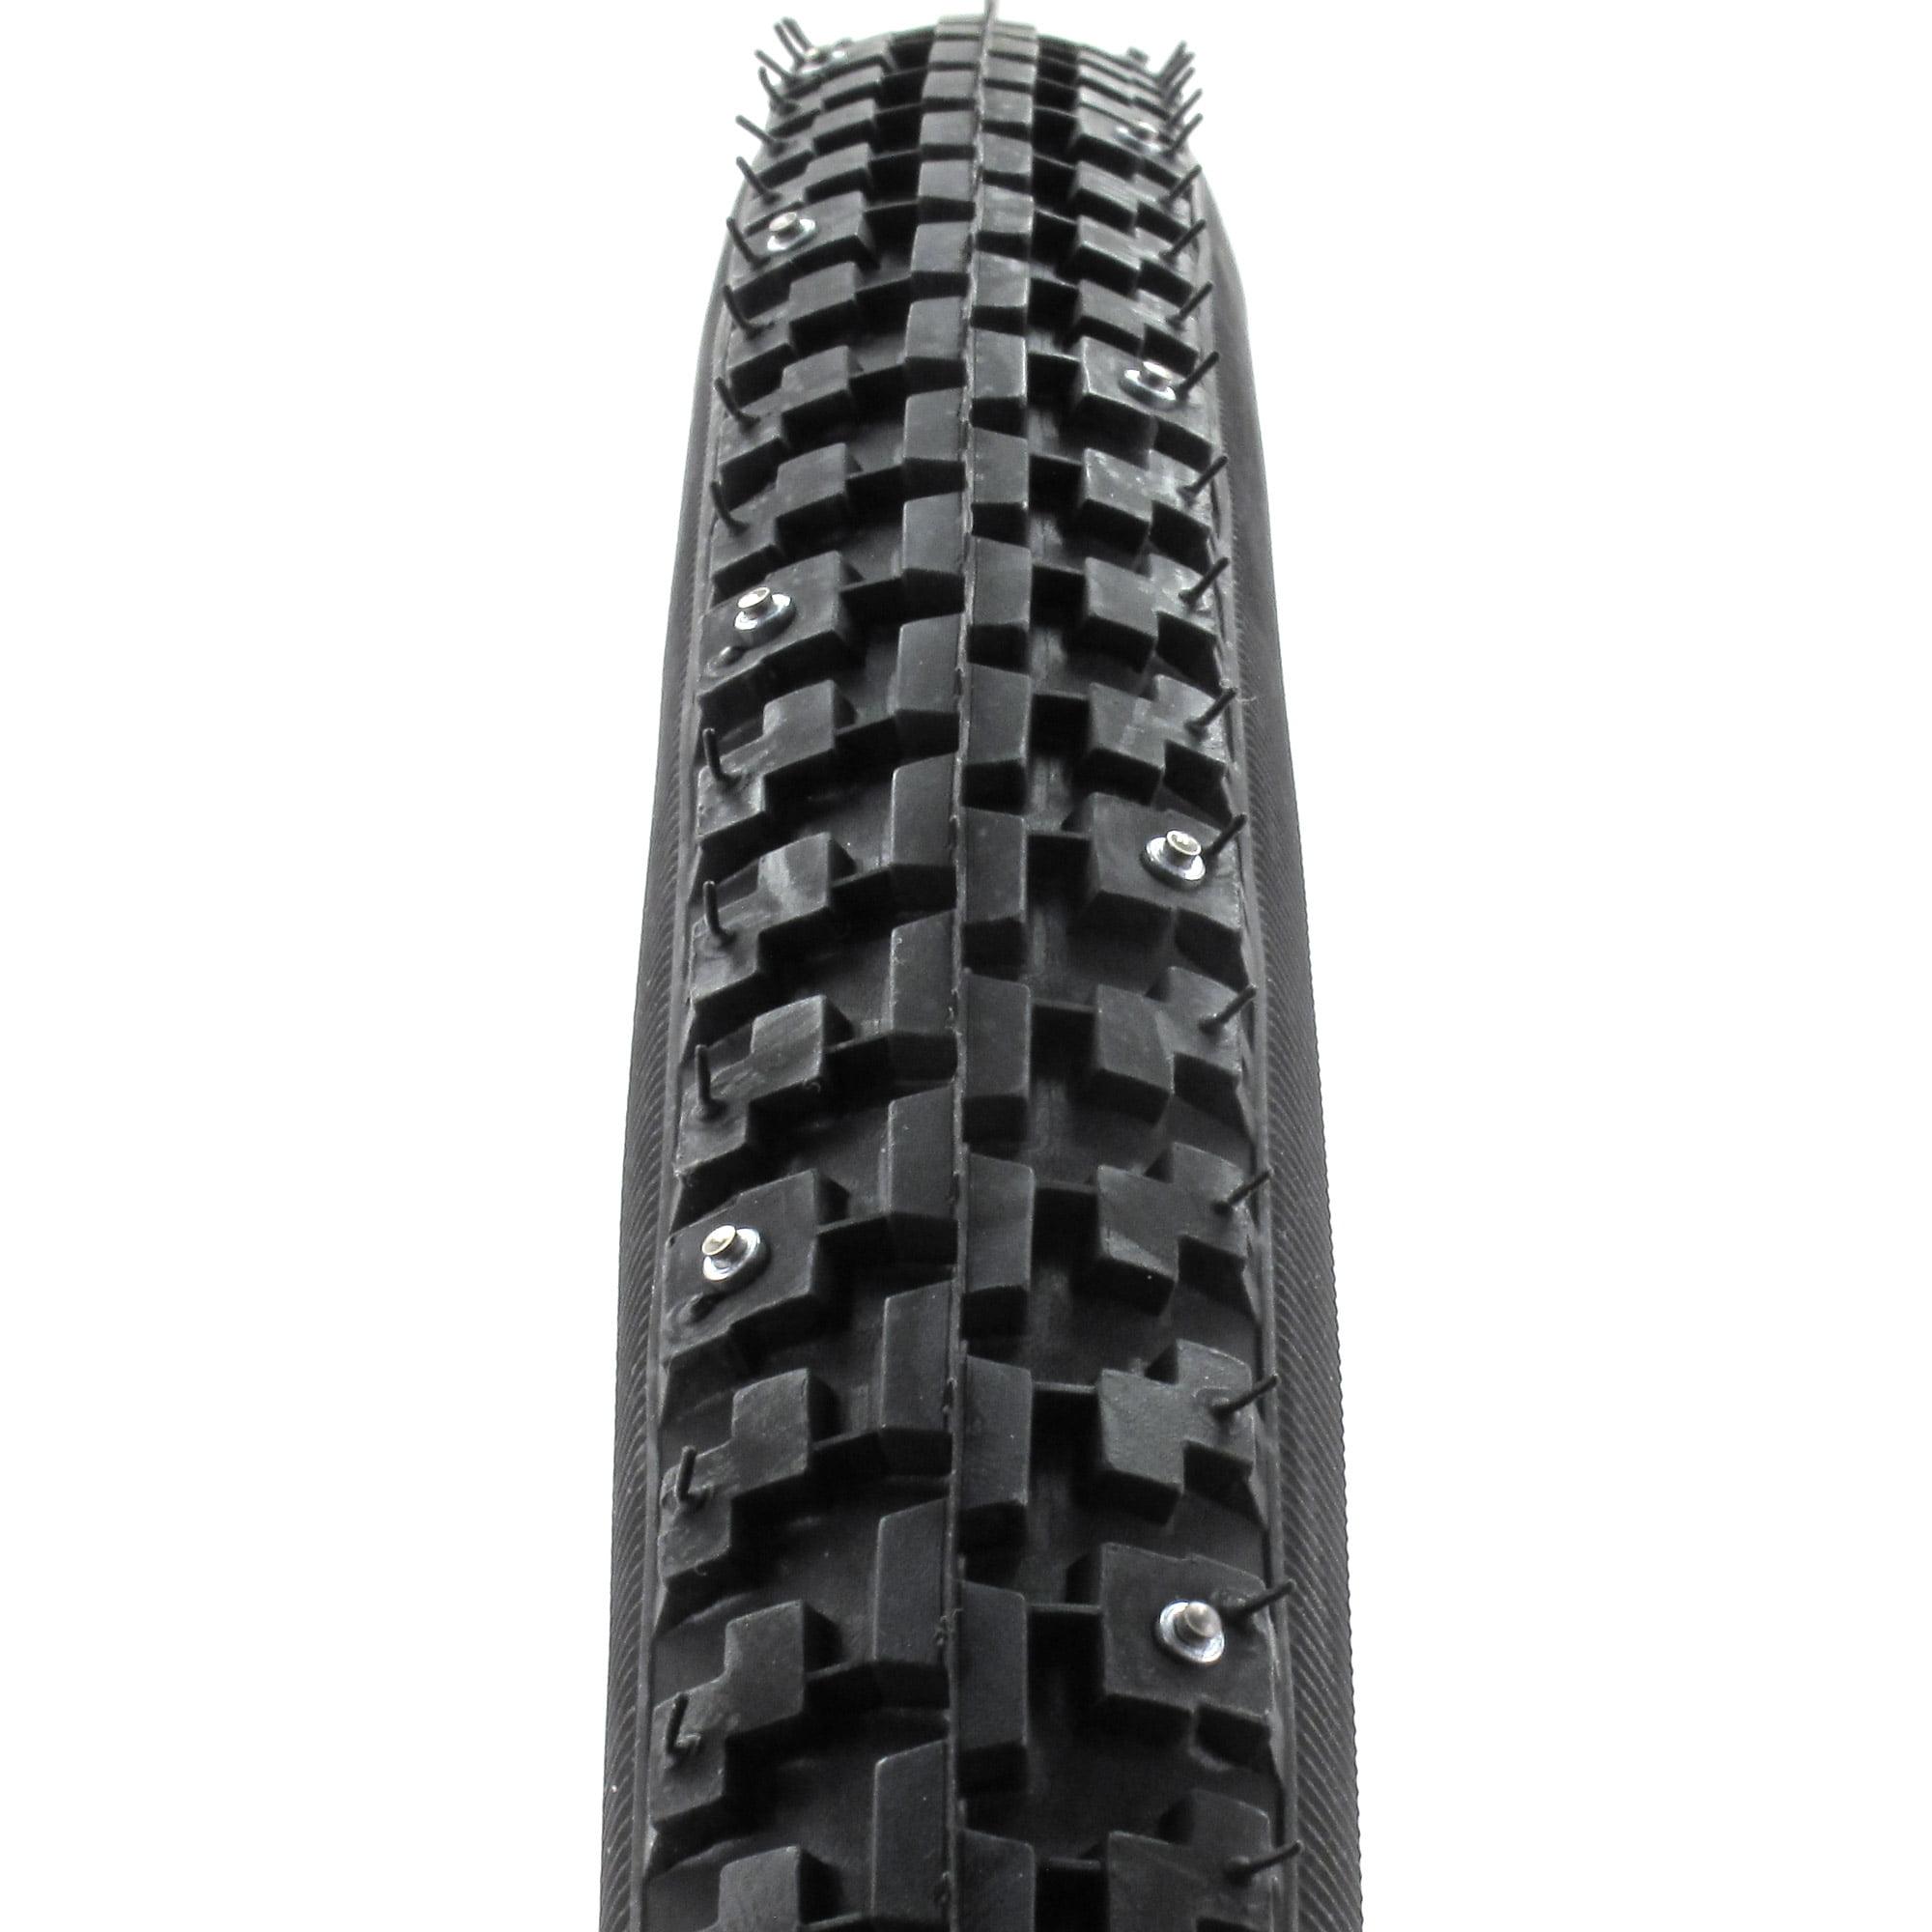 Nokian Studded Tire 700c x 37mm T203281 HAKKAPELIITTA Bicycle Snow Ice Charity!